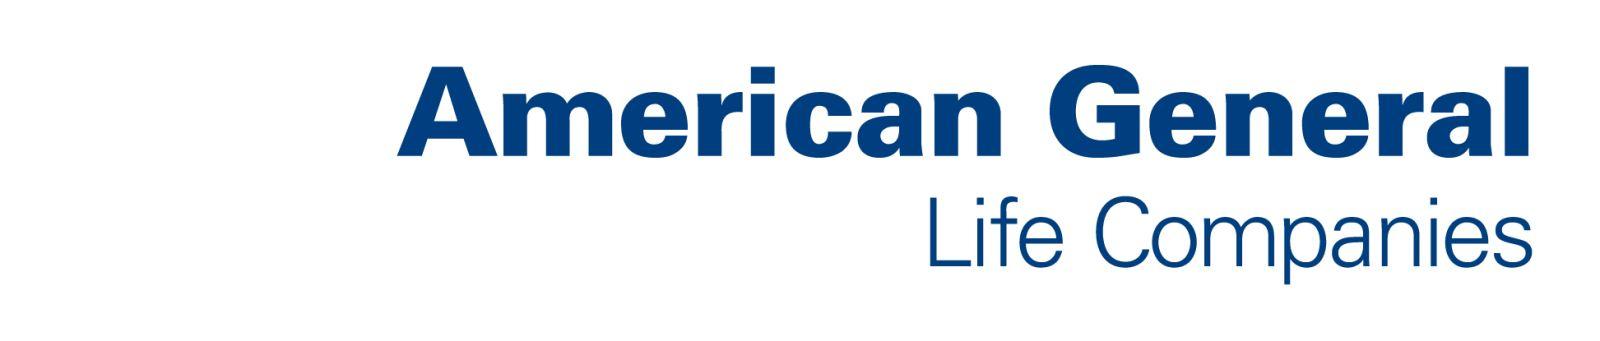 Life Insurance Company American General Life Insurance Company